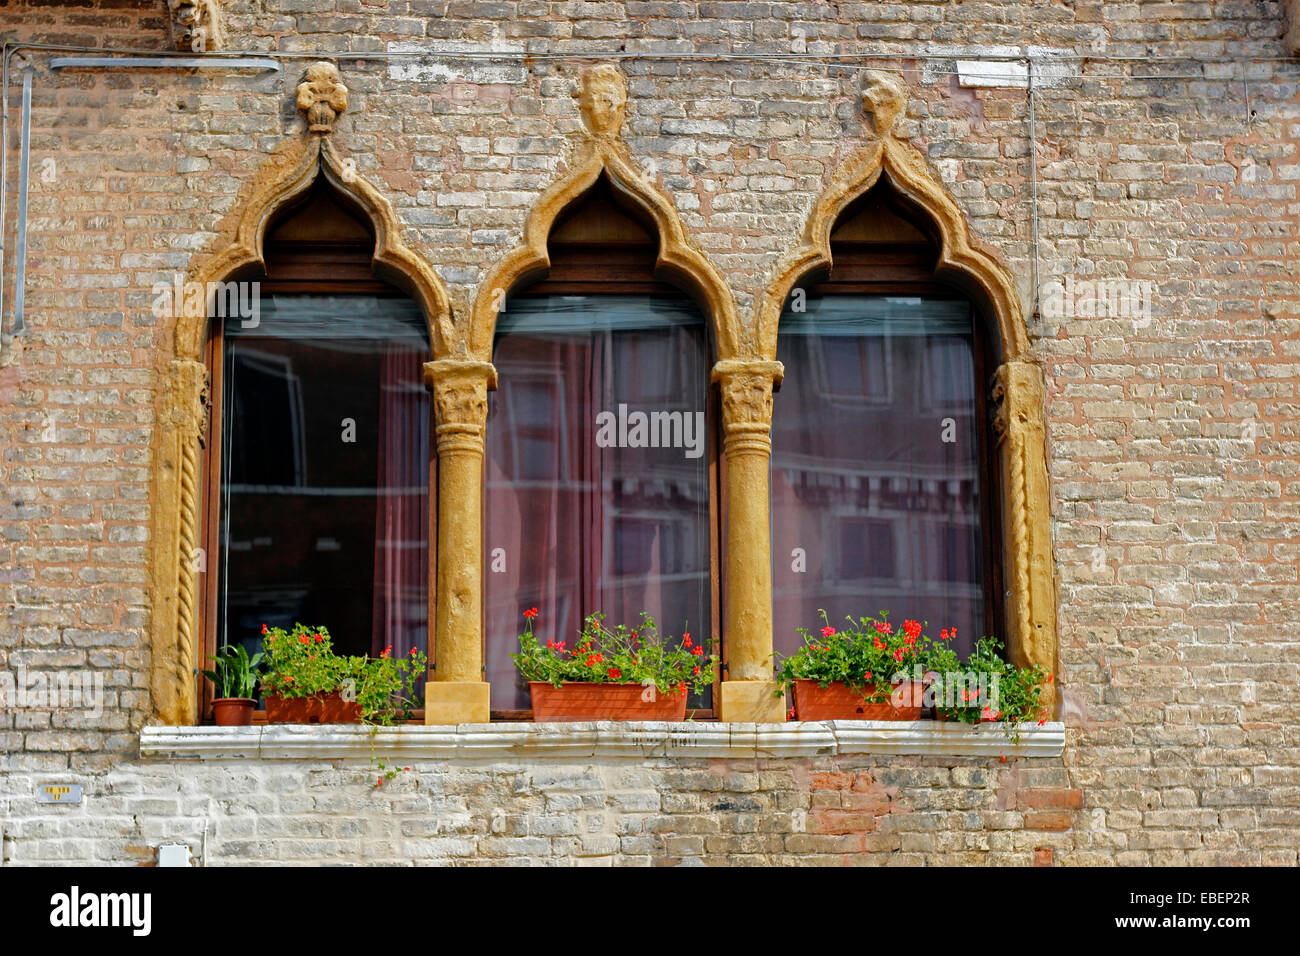 Venice Italy Castello Palladian windows with Moorish influence - Stock Image